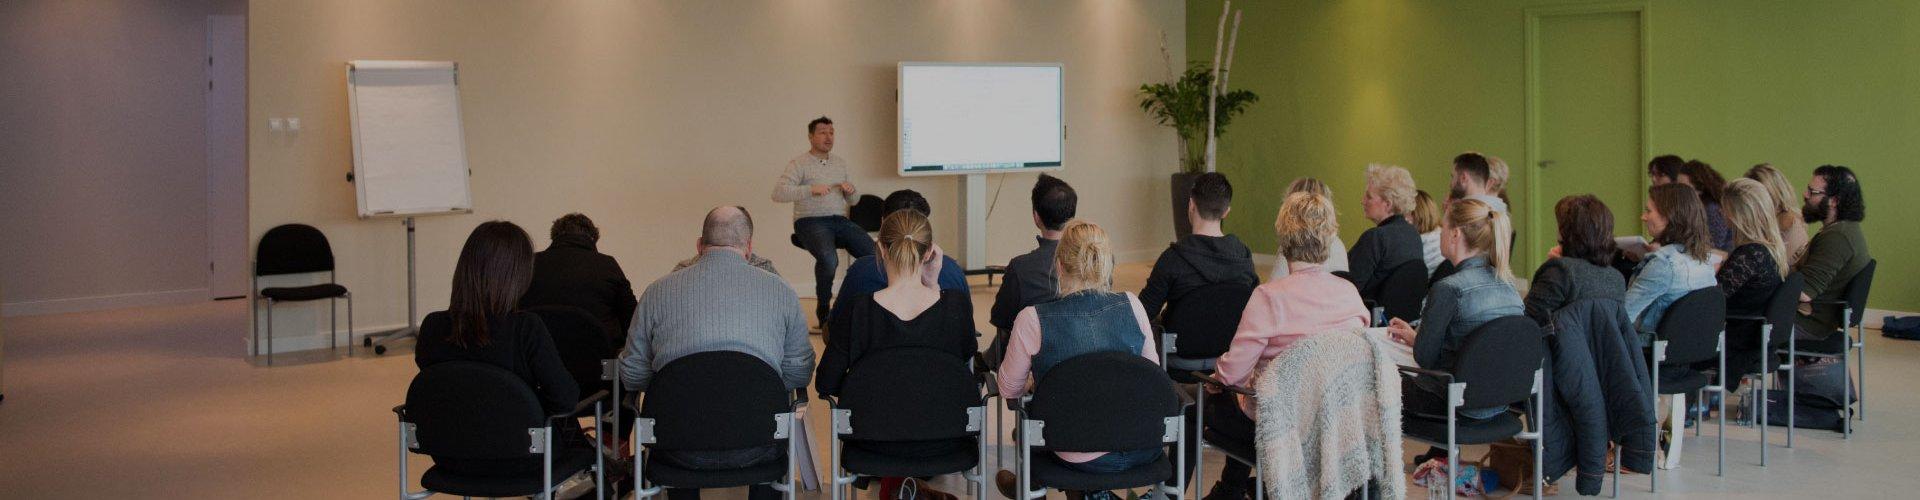 Master Practitioner presentatie